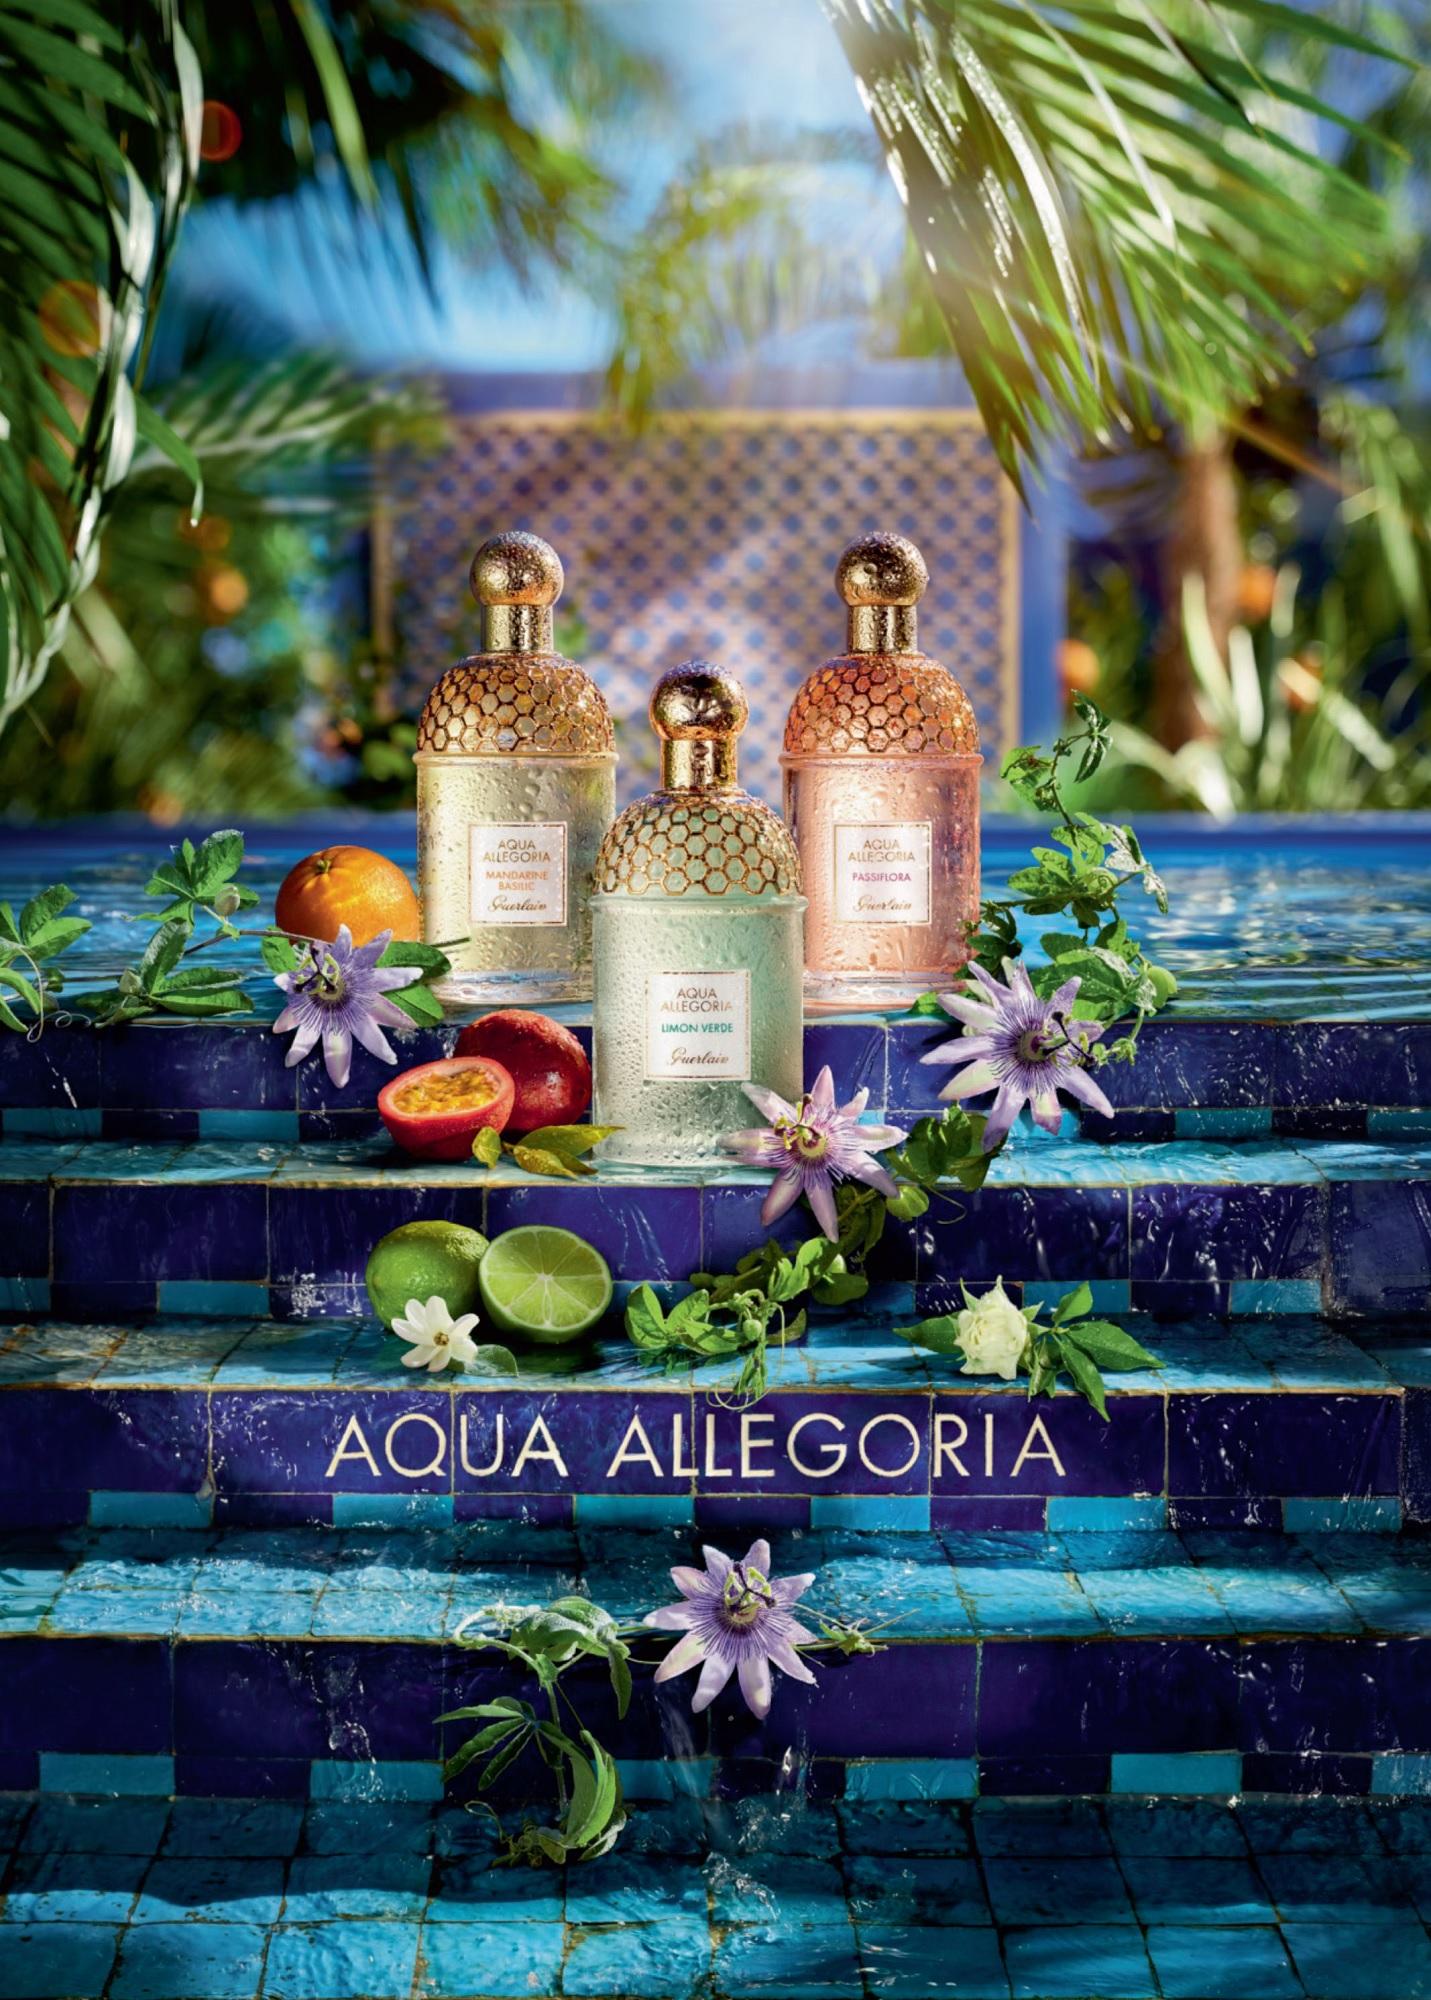 Aqua Allegoria Passiflora Guerlain Perfume A New Fragrance For